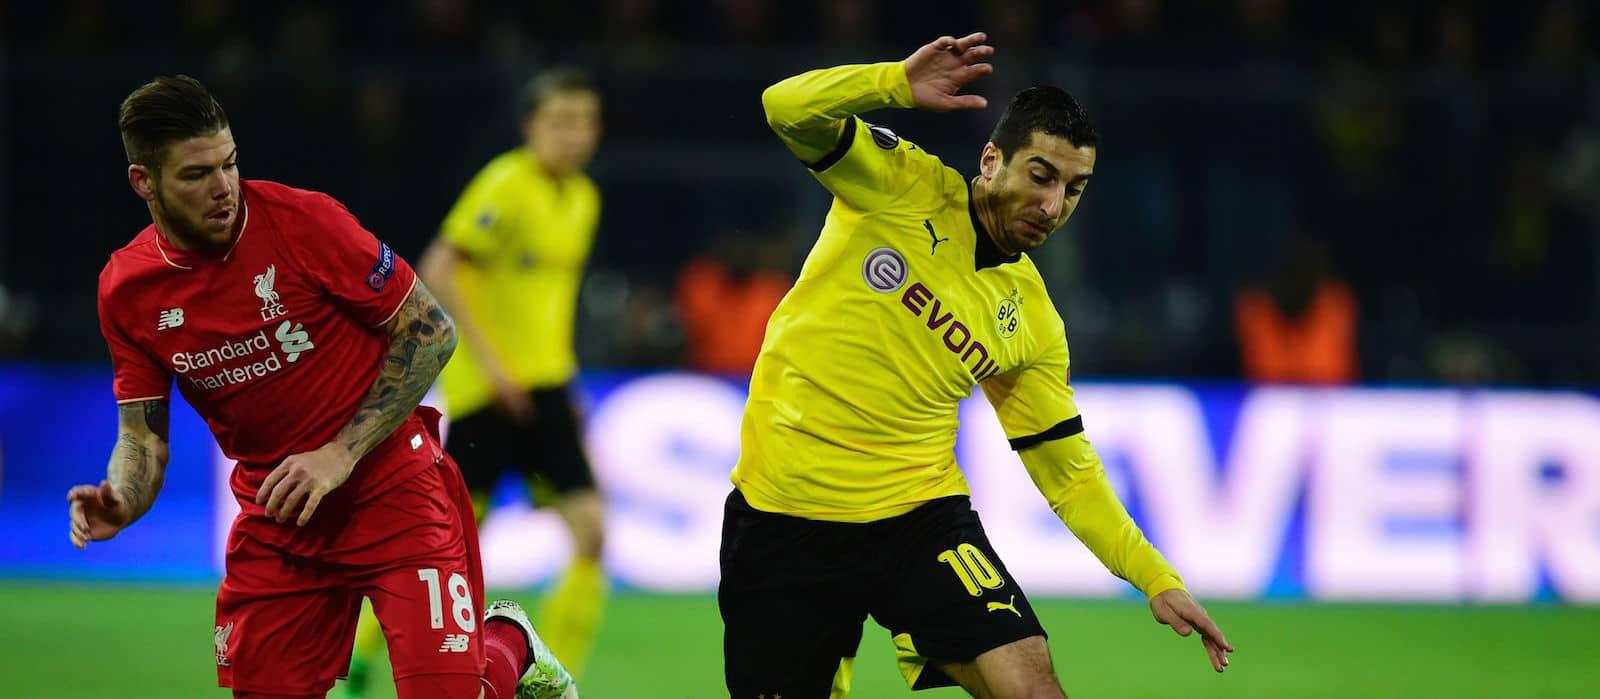 Borussia Dortmund block Manchester United's move for Henrikh Mkhitaryan